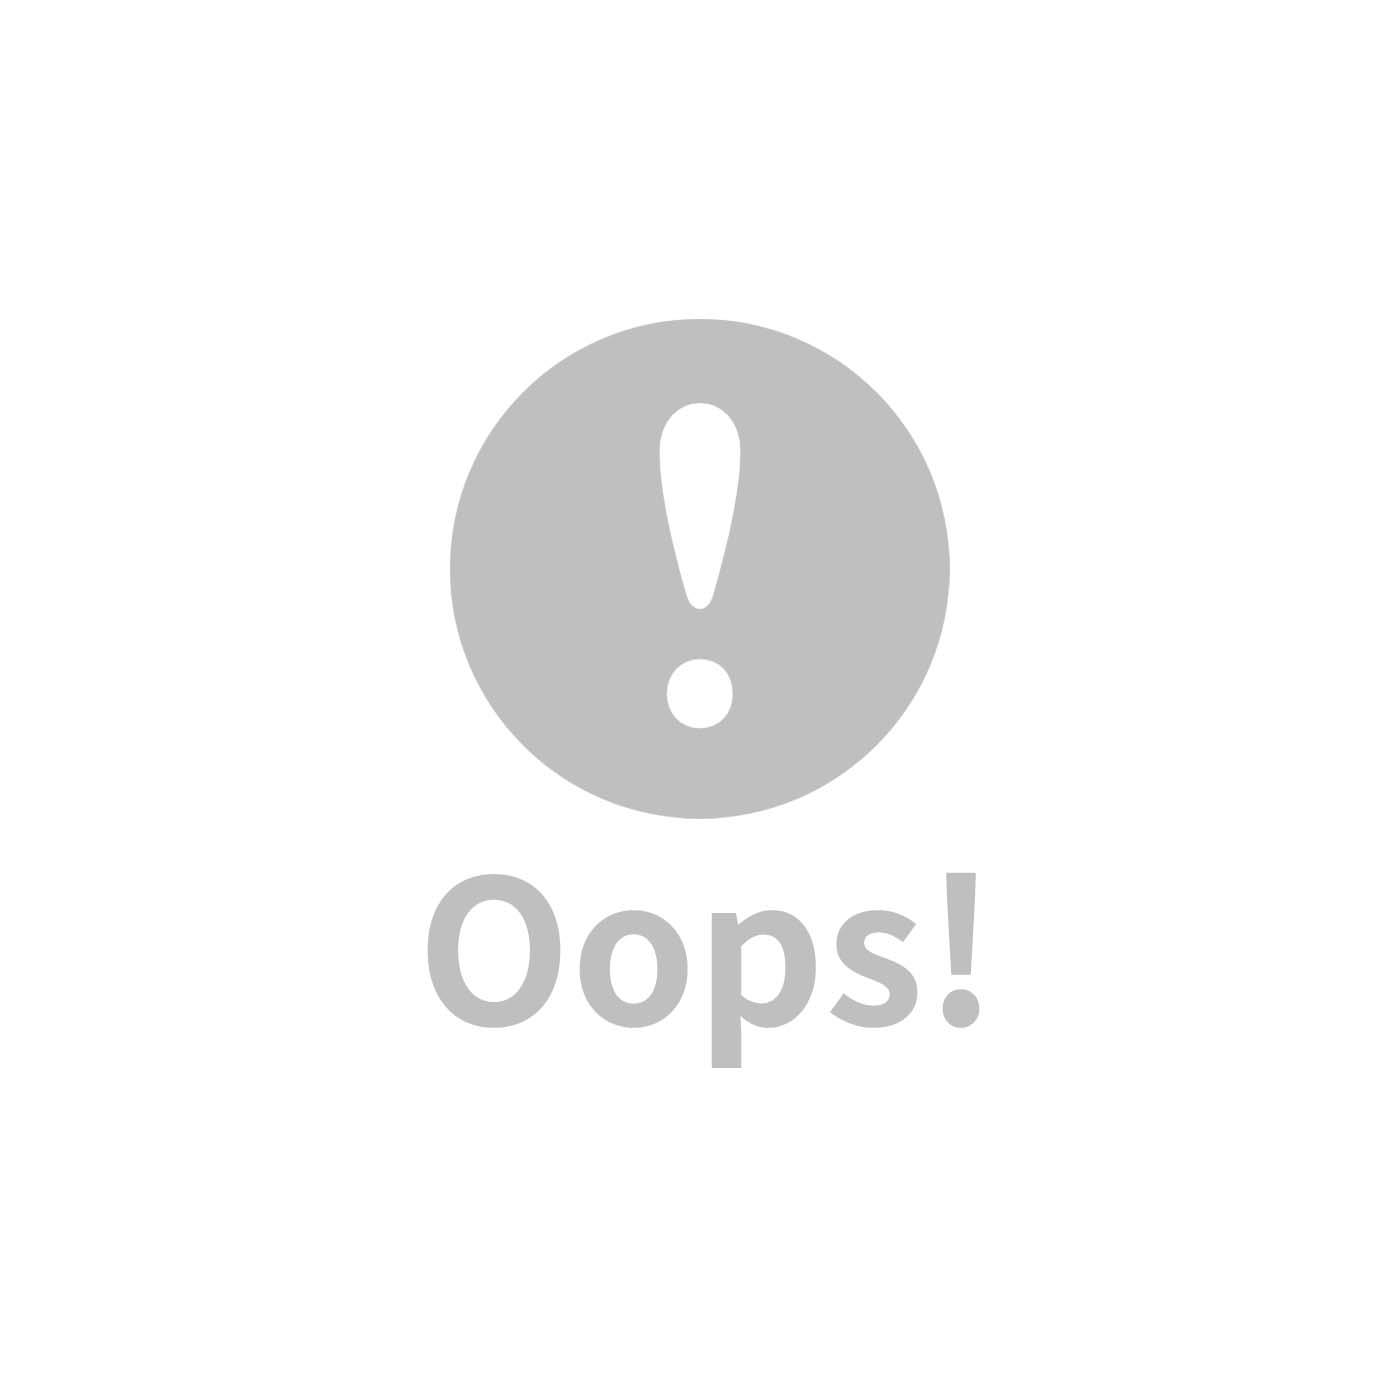 Pacific Baby 3in1全階段304不鏽鋼保溫奶瓶禮盒組200ml(7oz勇氣藍+天天藍配件組)